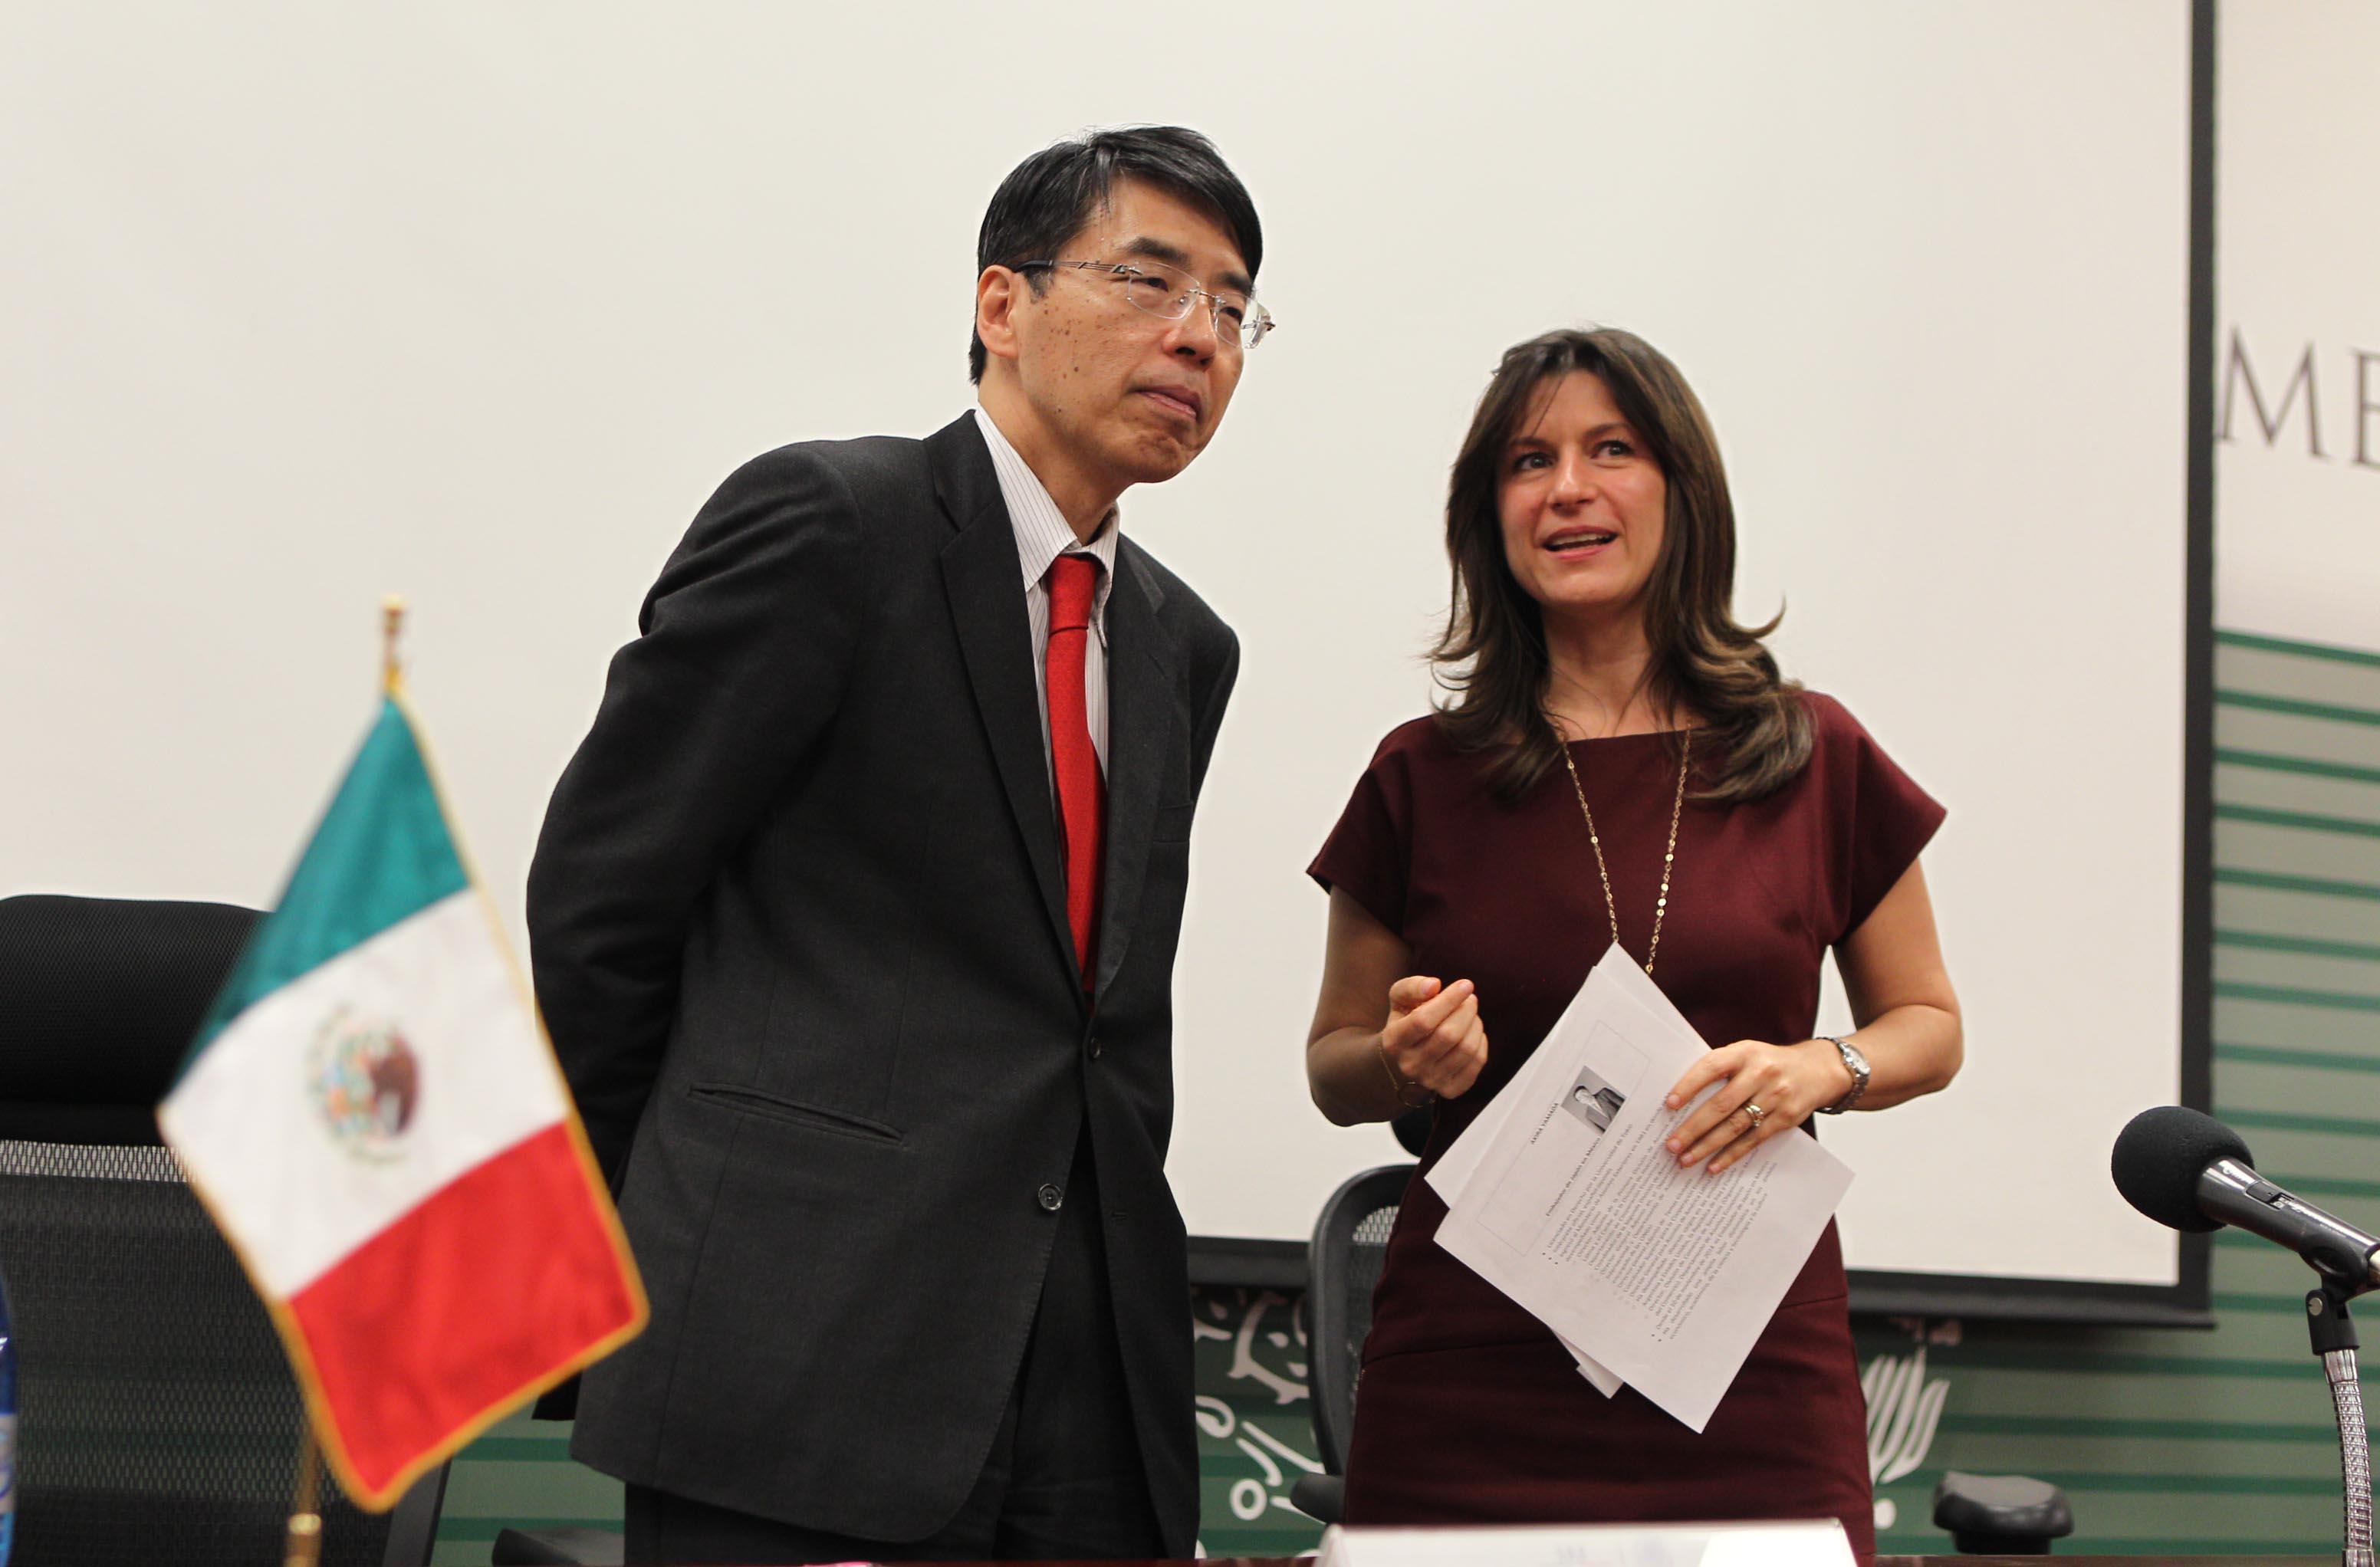 FOTO 2 Embajador de Jap n en M xico  Akira Yamada  con Natalia Saltalamacchiajpg